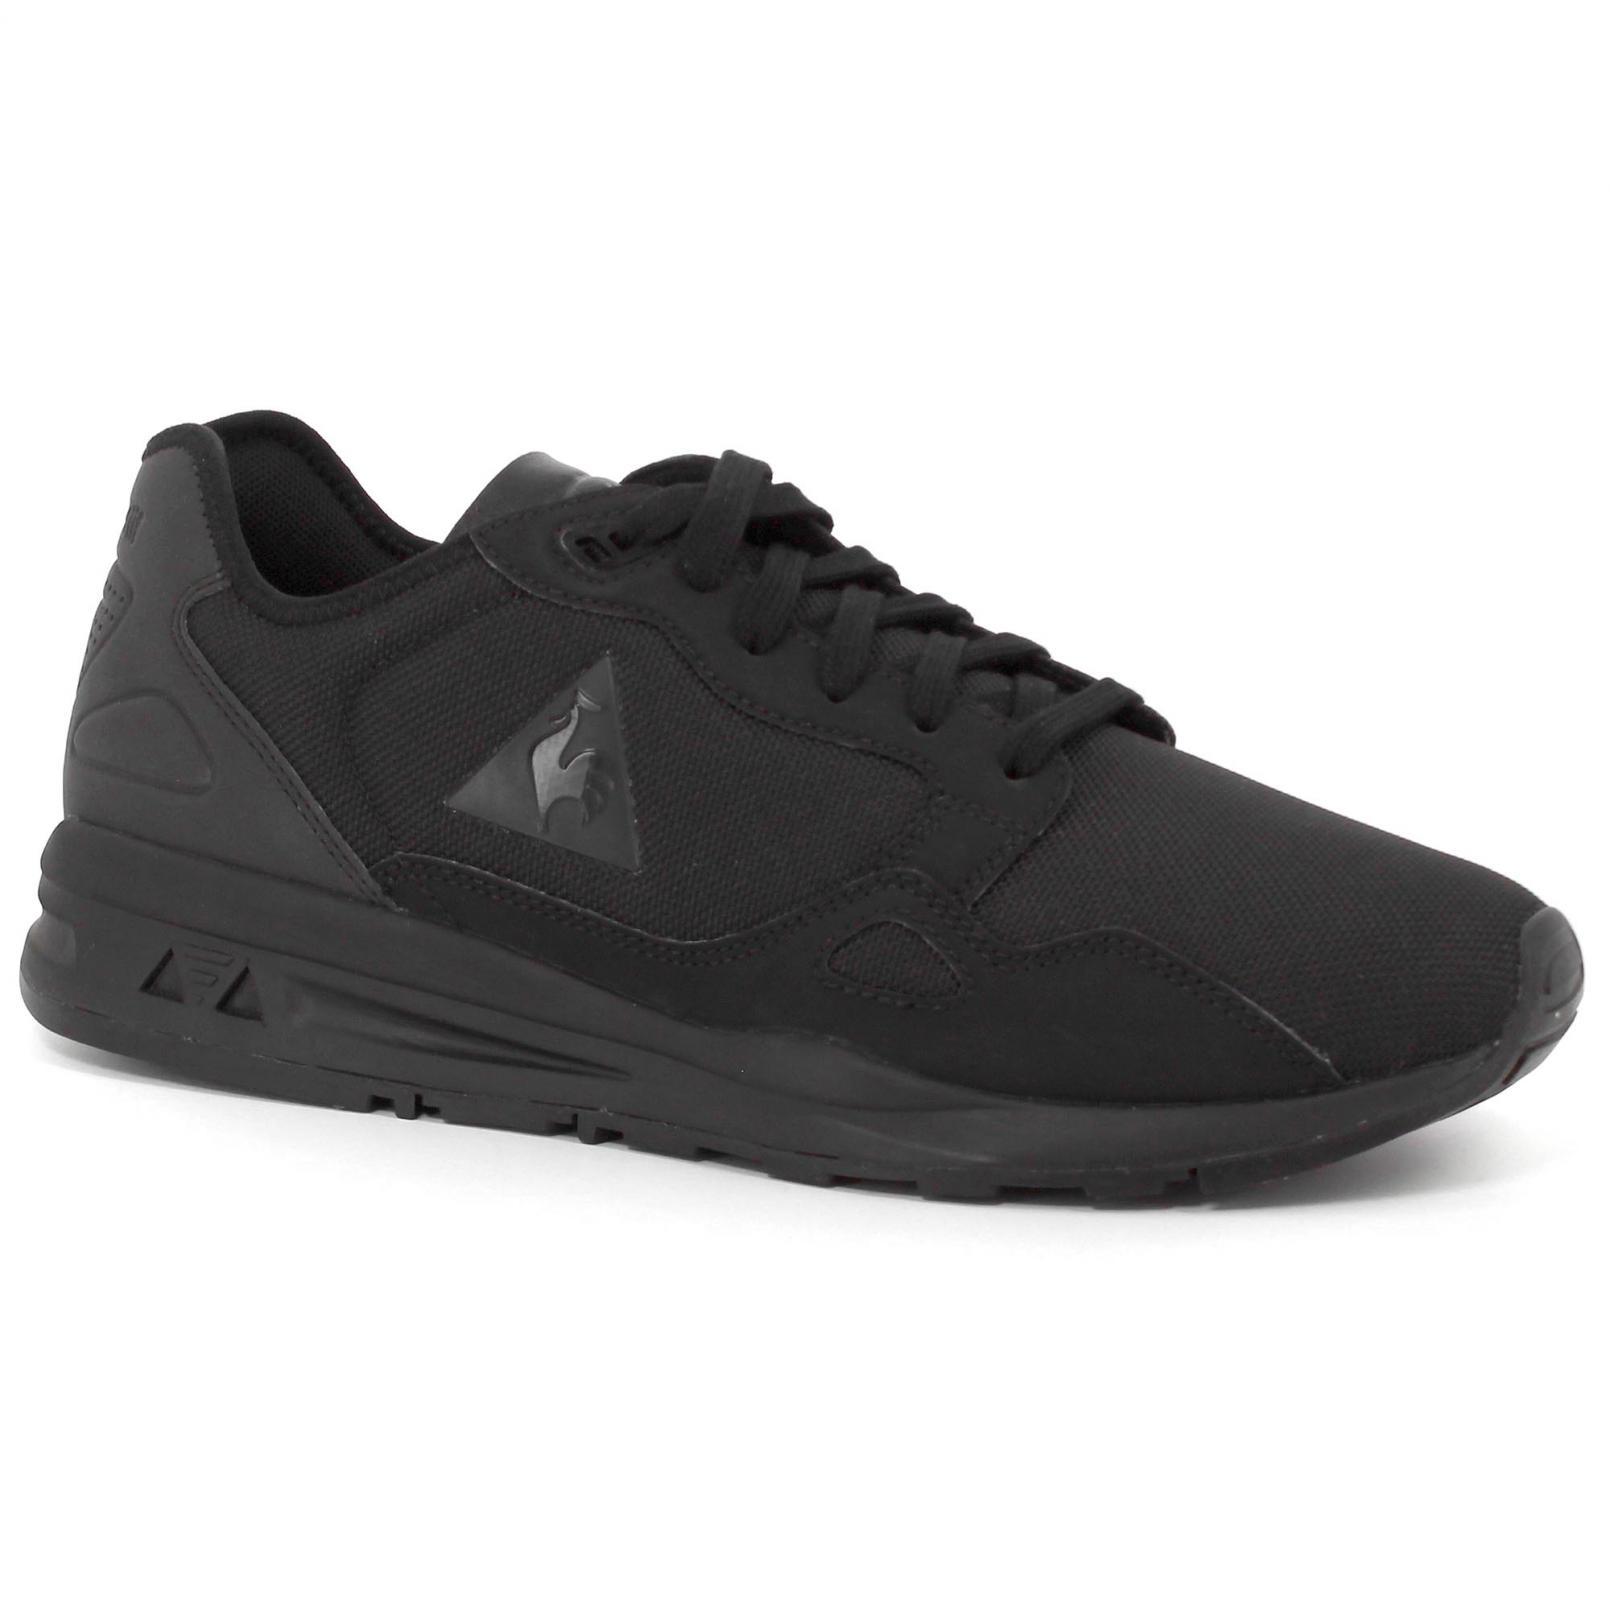 Shoes – Le Coq Sportif Lcs R9Xt Monochrome Reflective Black